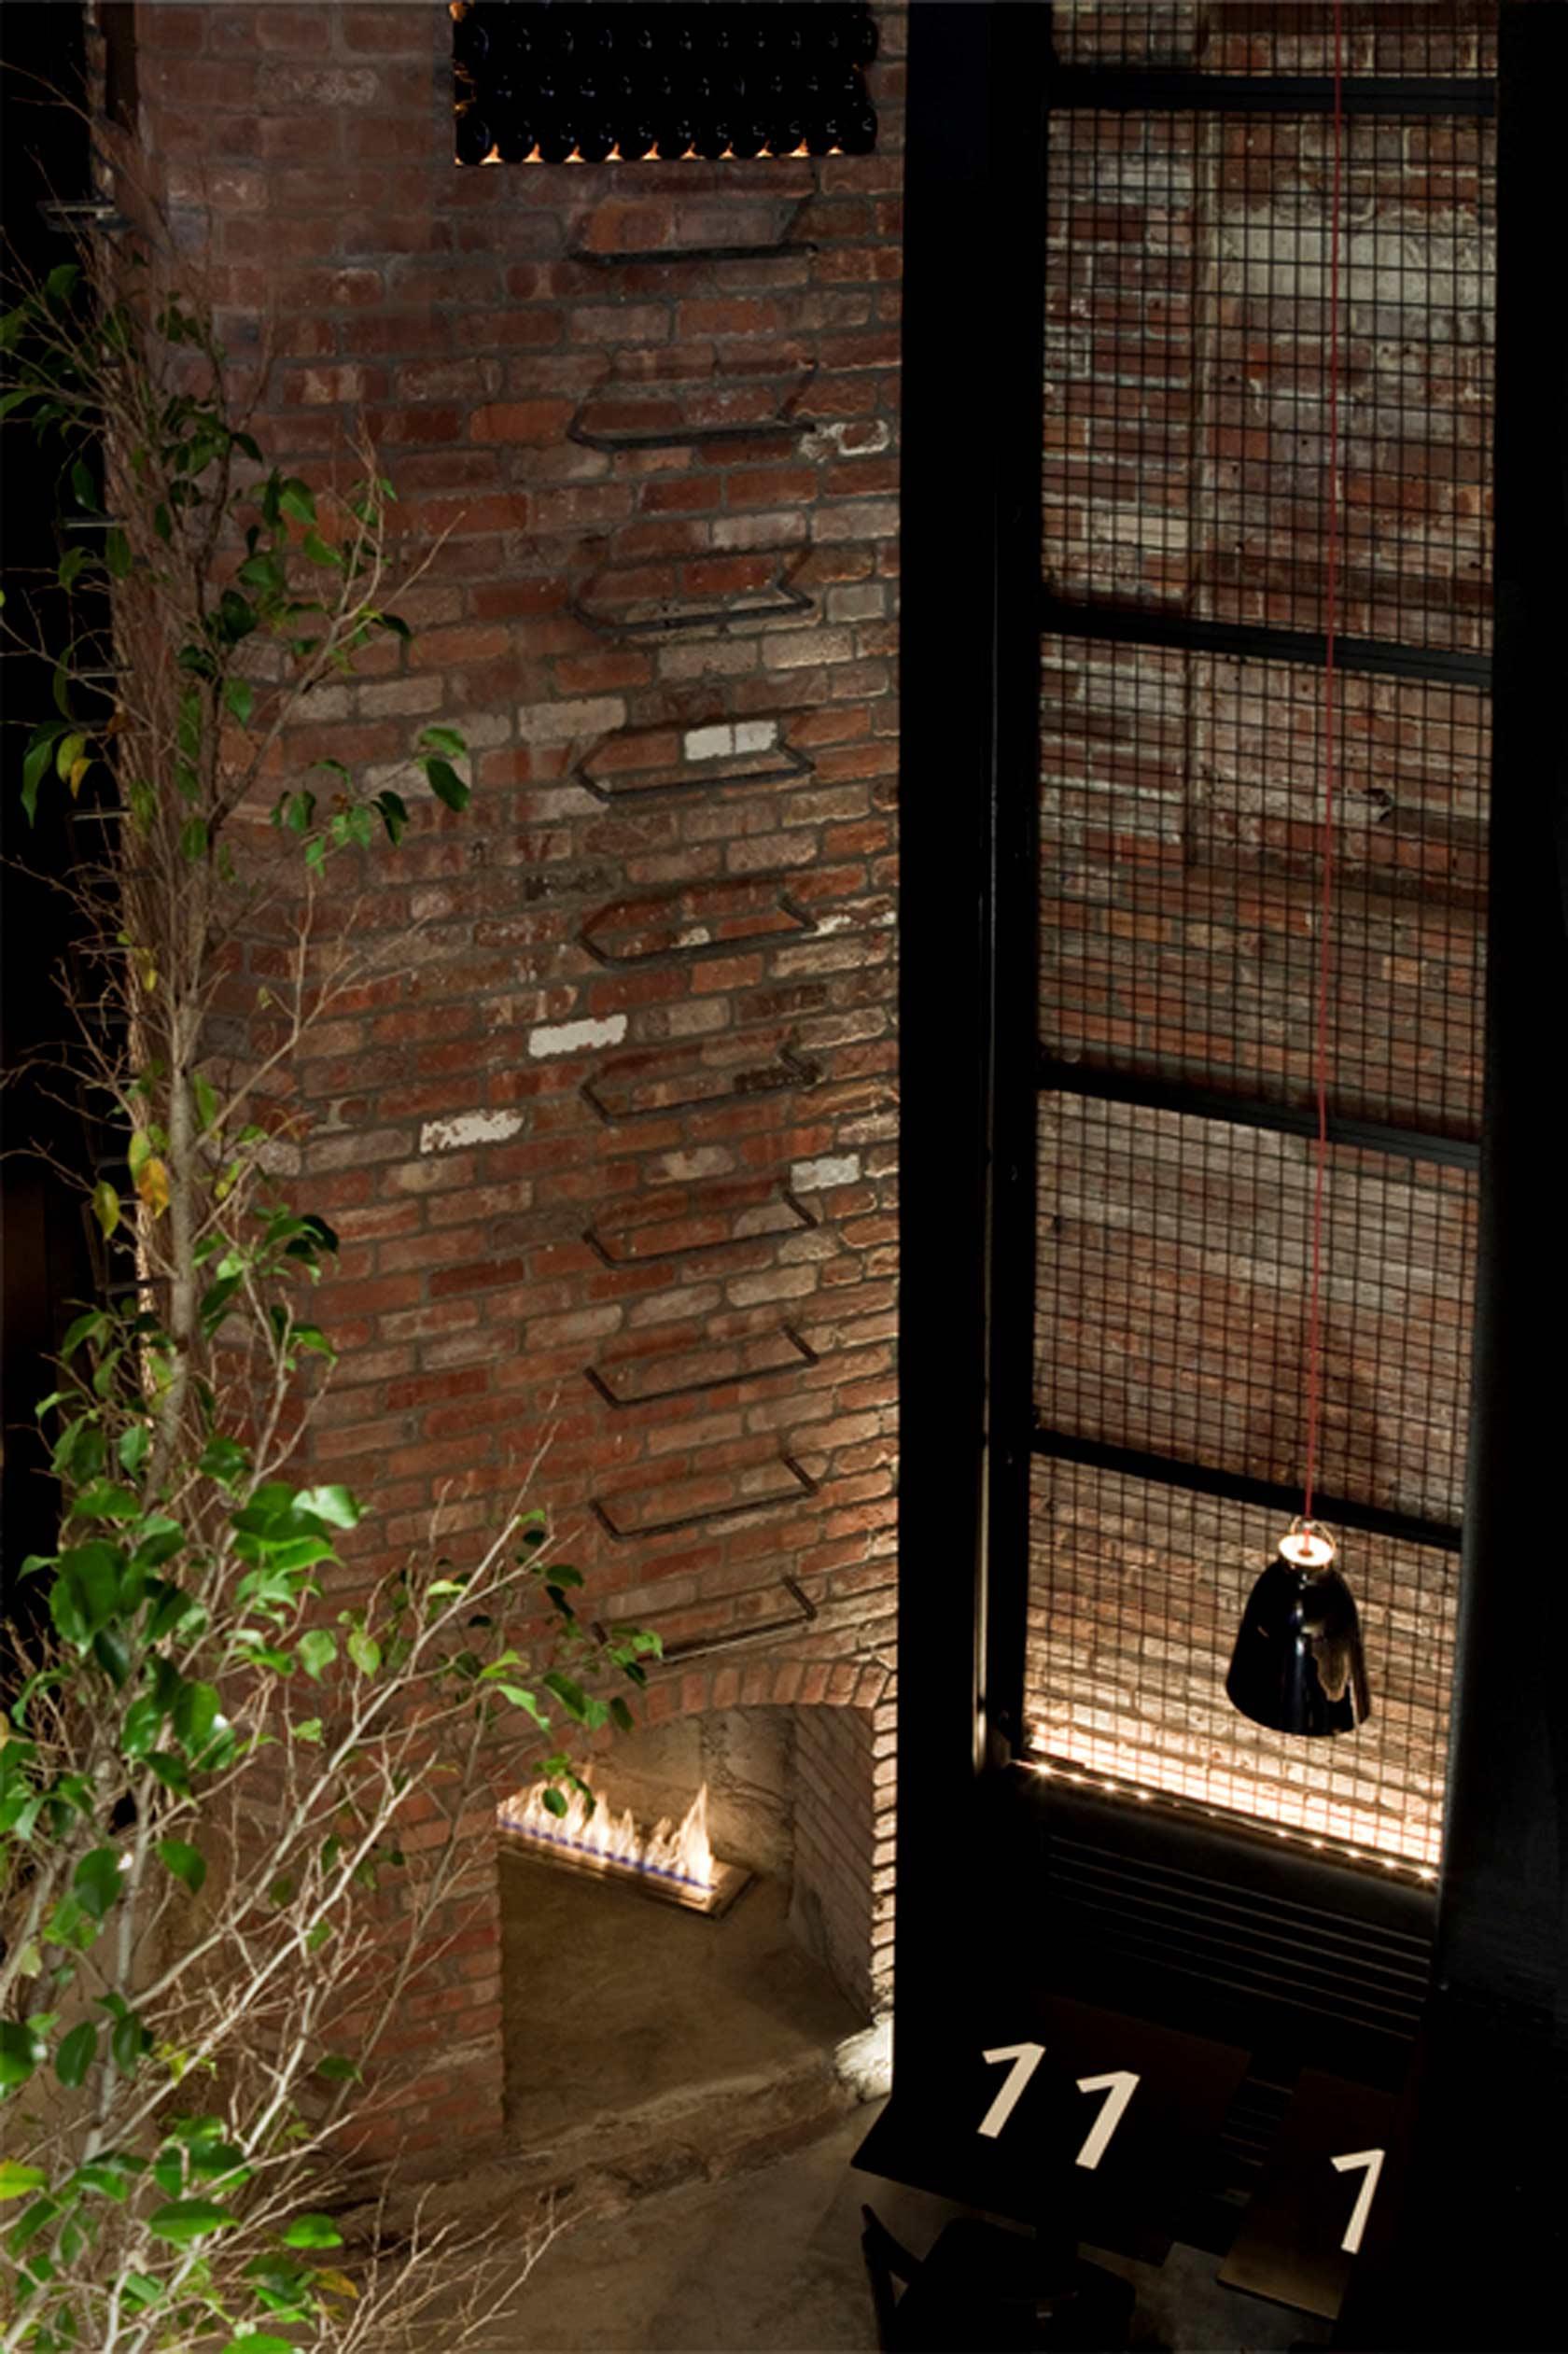 Tartinery Restaurant Nolita by Sguera Architecture PLLC, Leo Sguera architect NY.